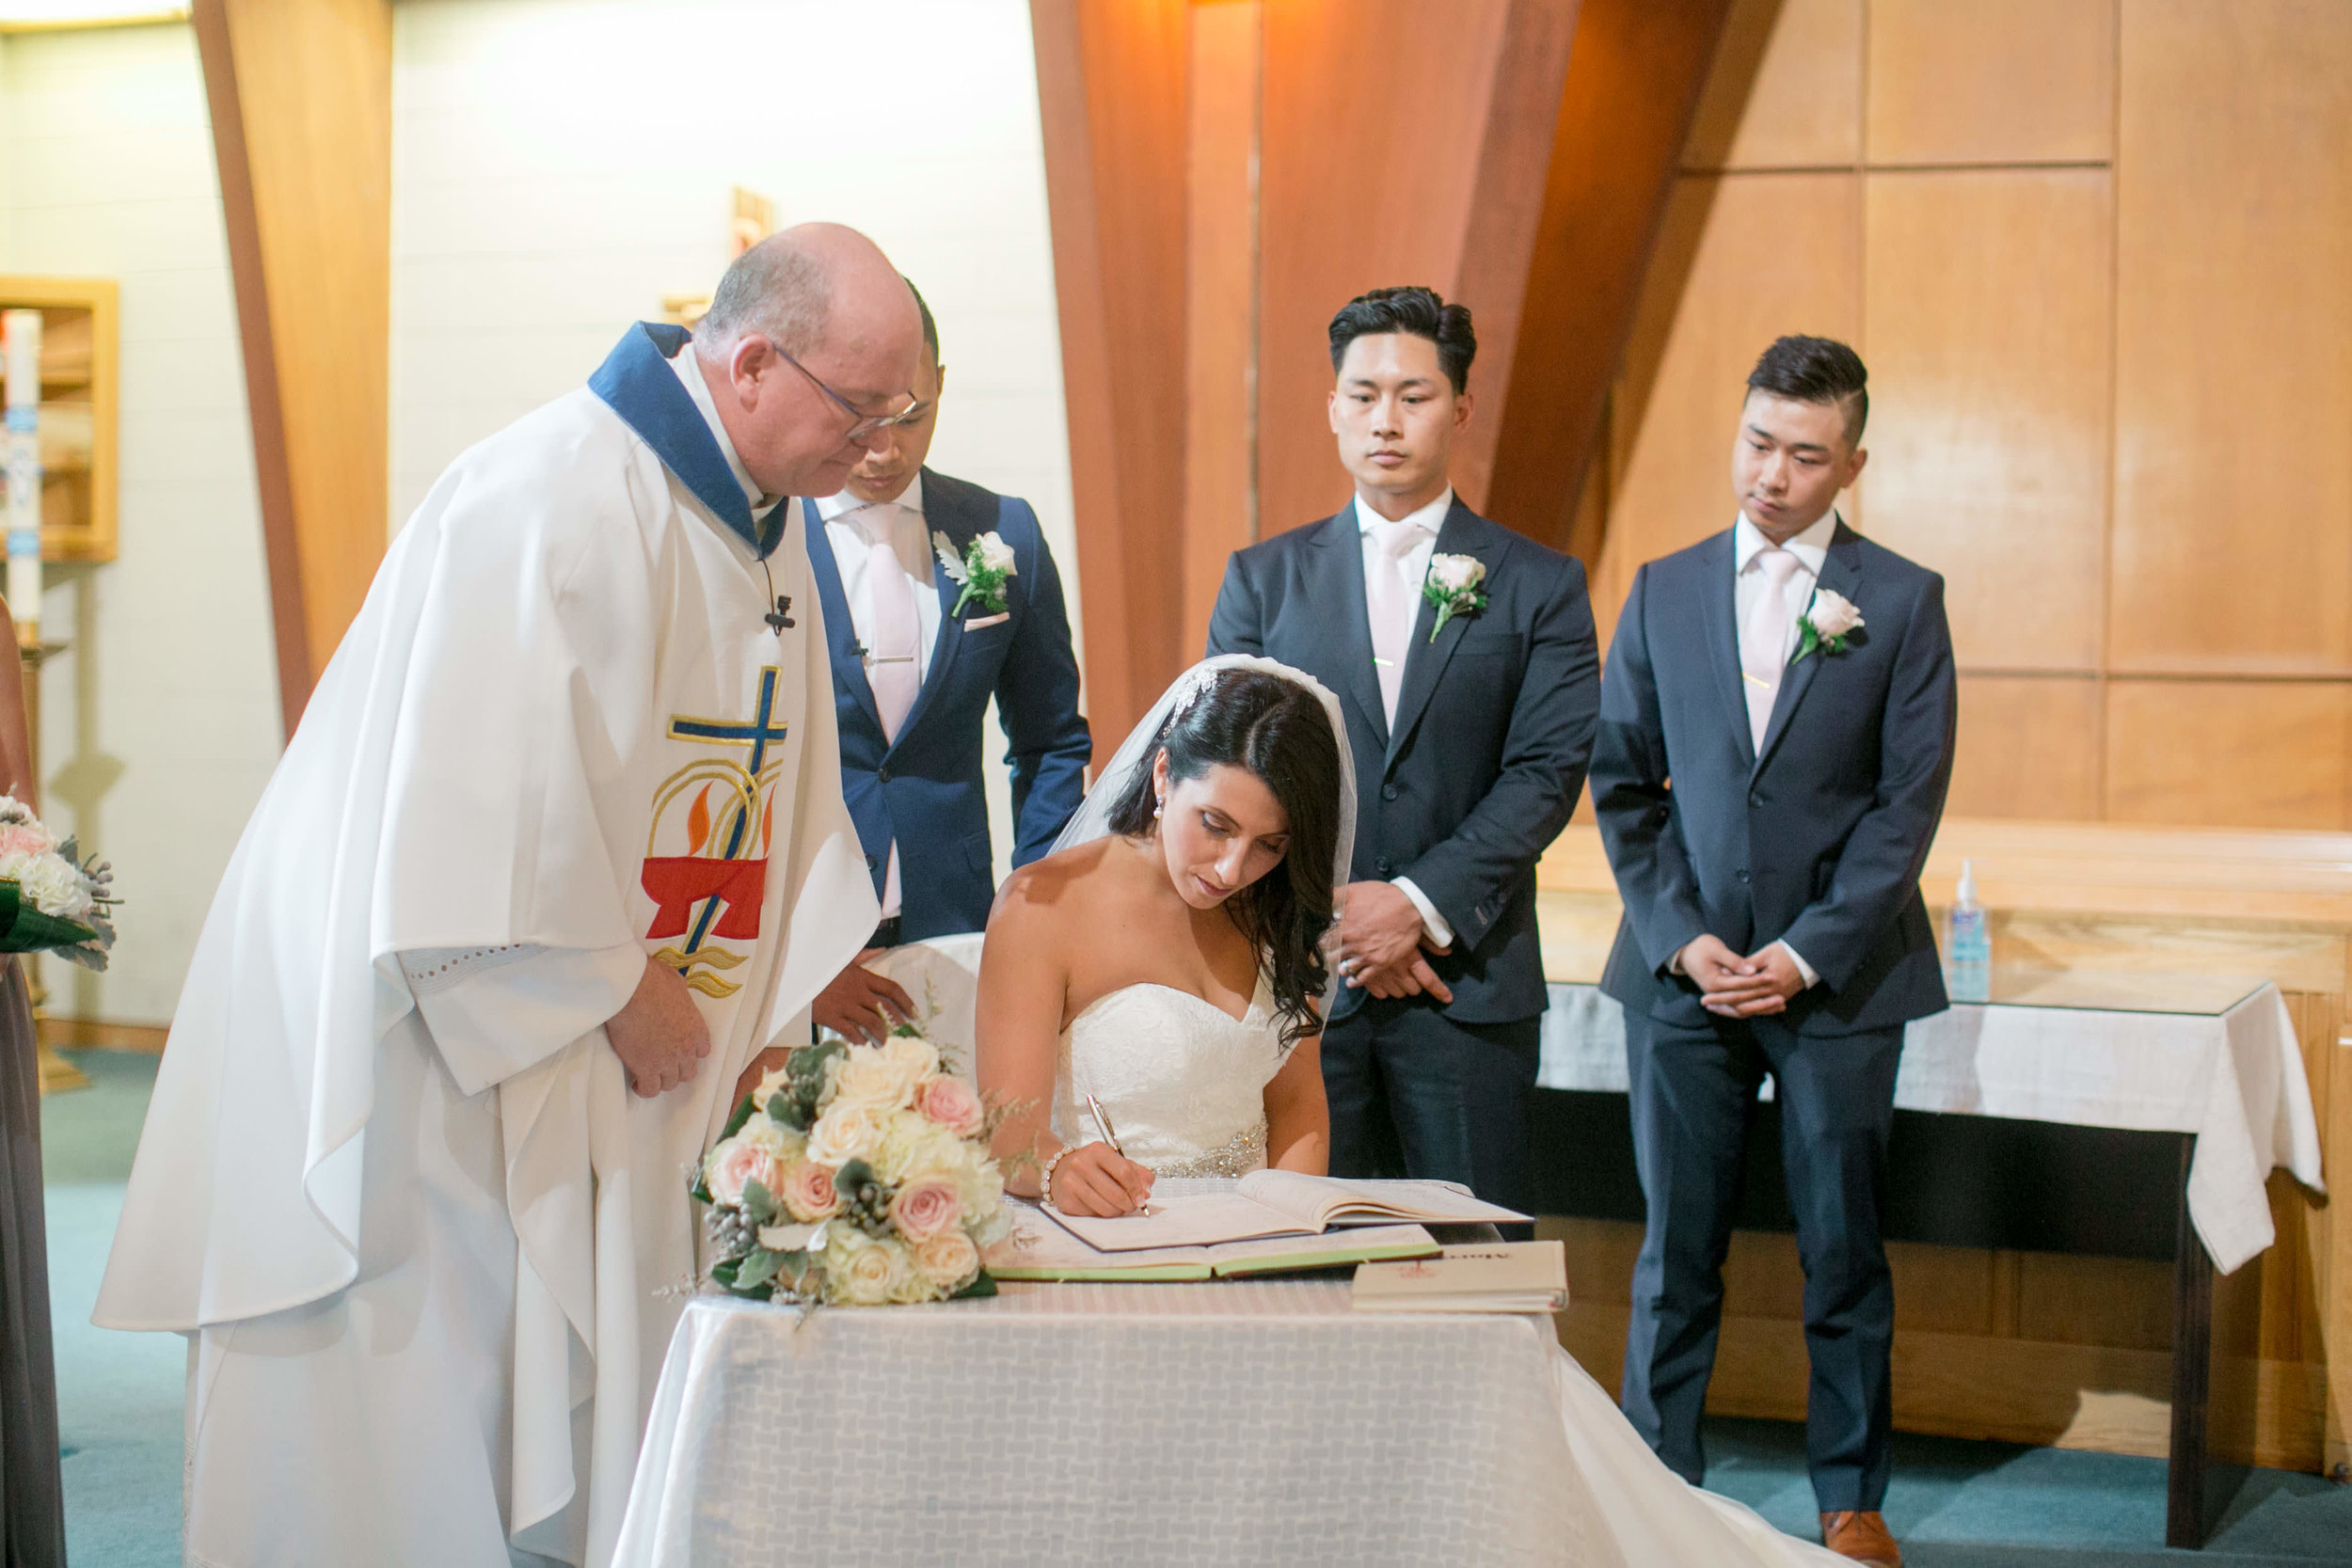 Stefanie___Bernard___Daniel_Ricci_Weddings_High_Res._Finals__276.jpg